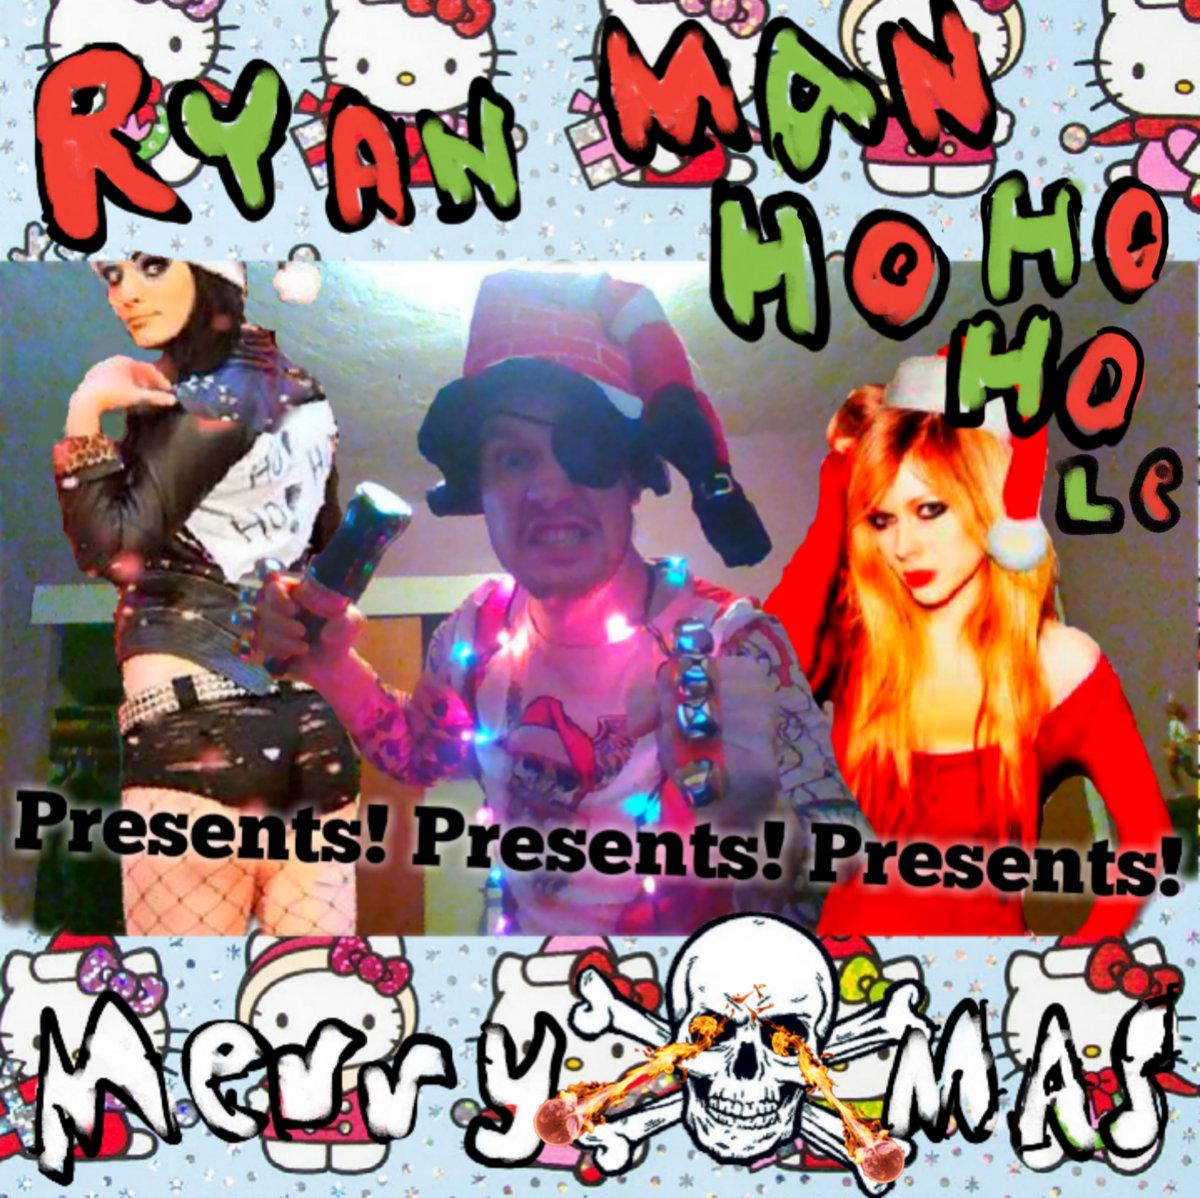 xmas everybody slade cover from ryan man ho ho hole presents presents presents merry mas by various artists - Slade Merry Christmas Everybody